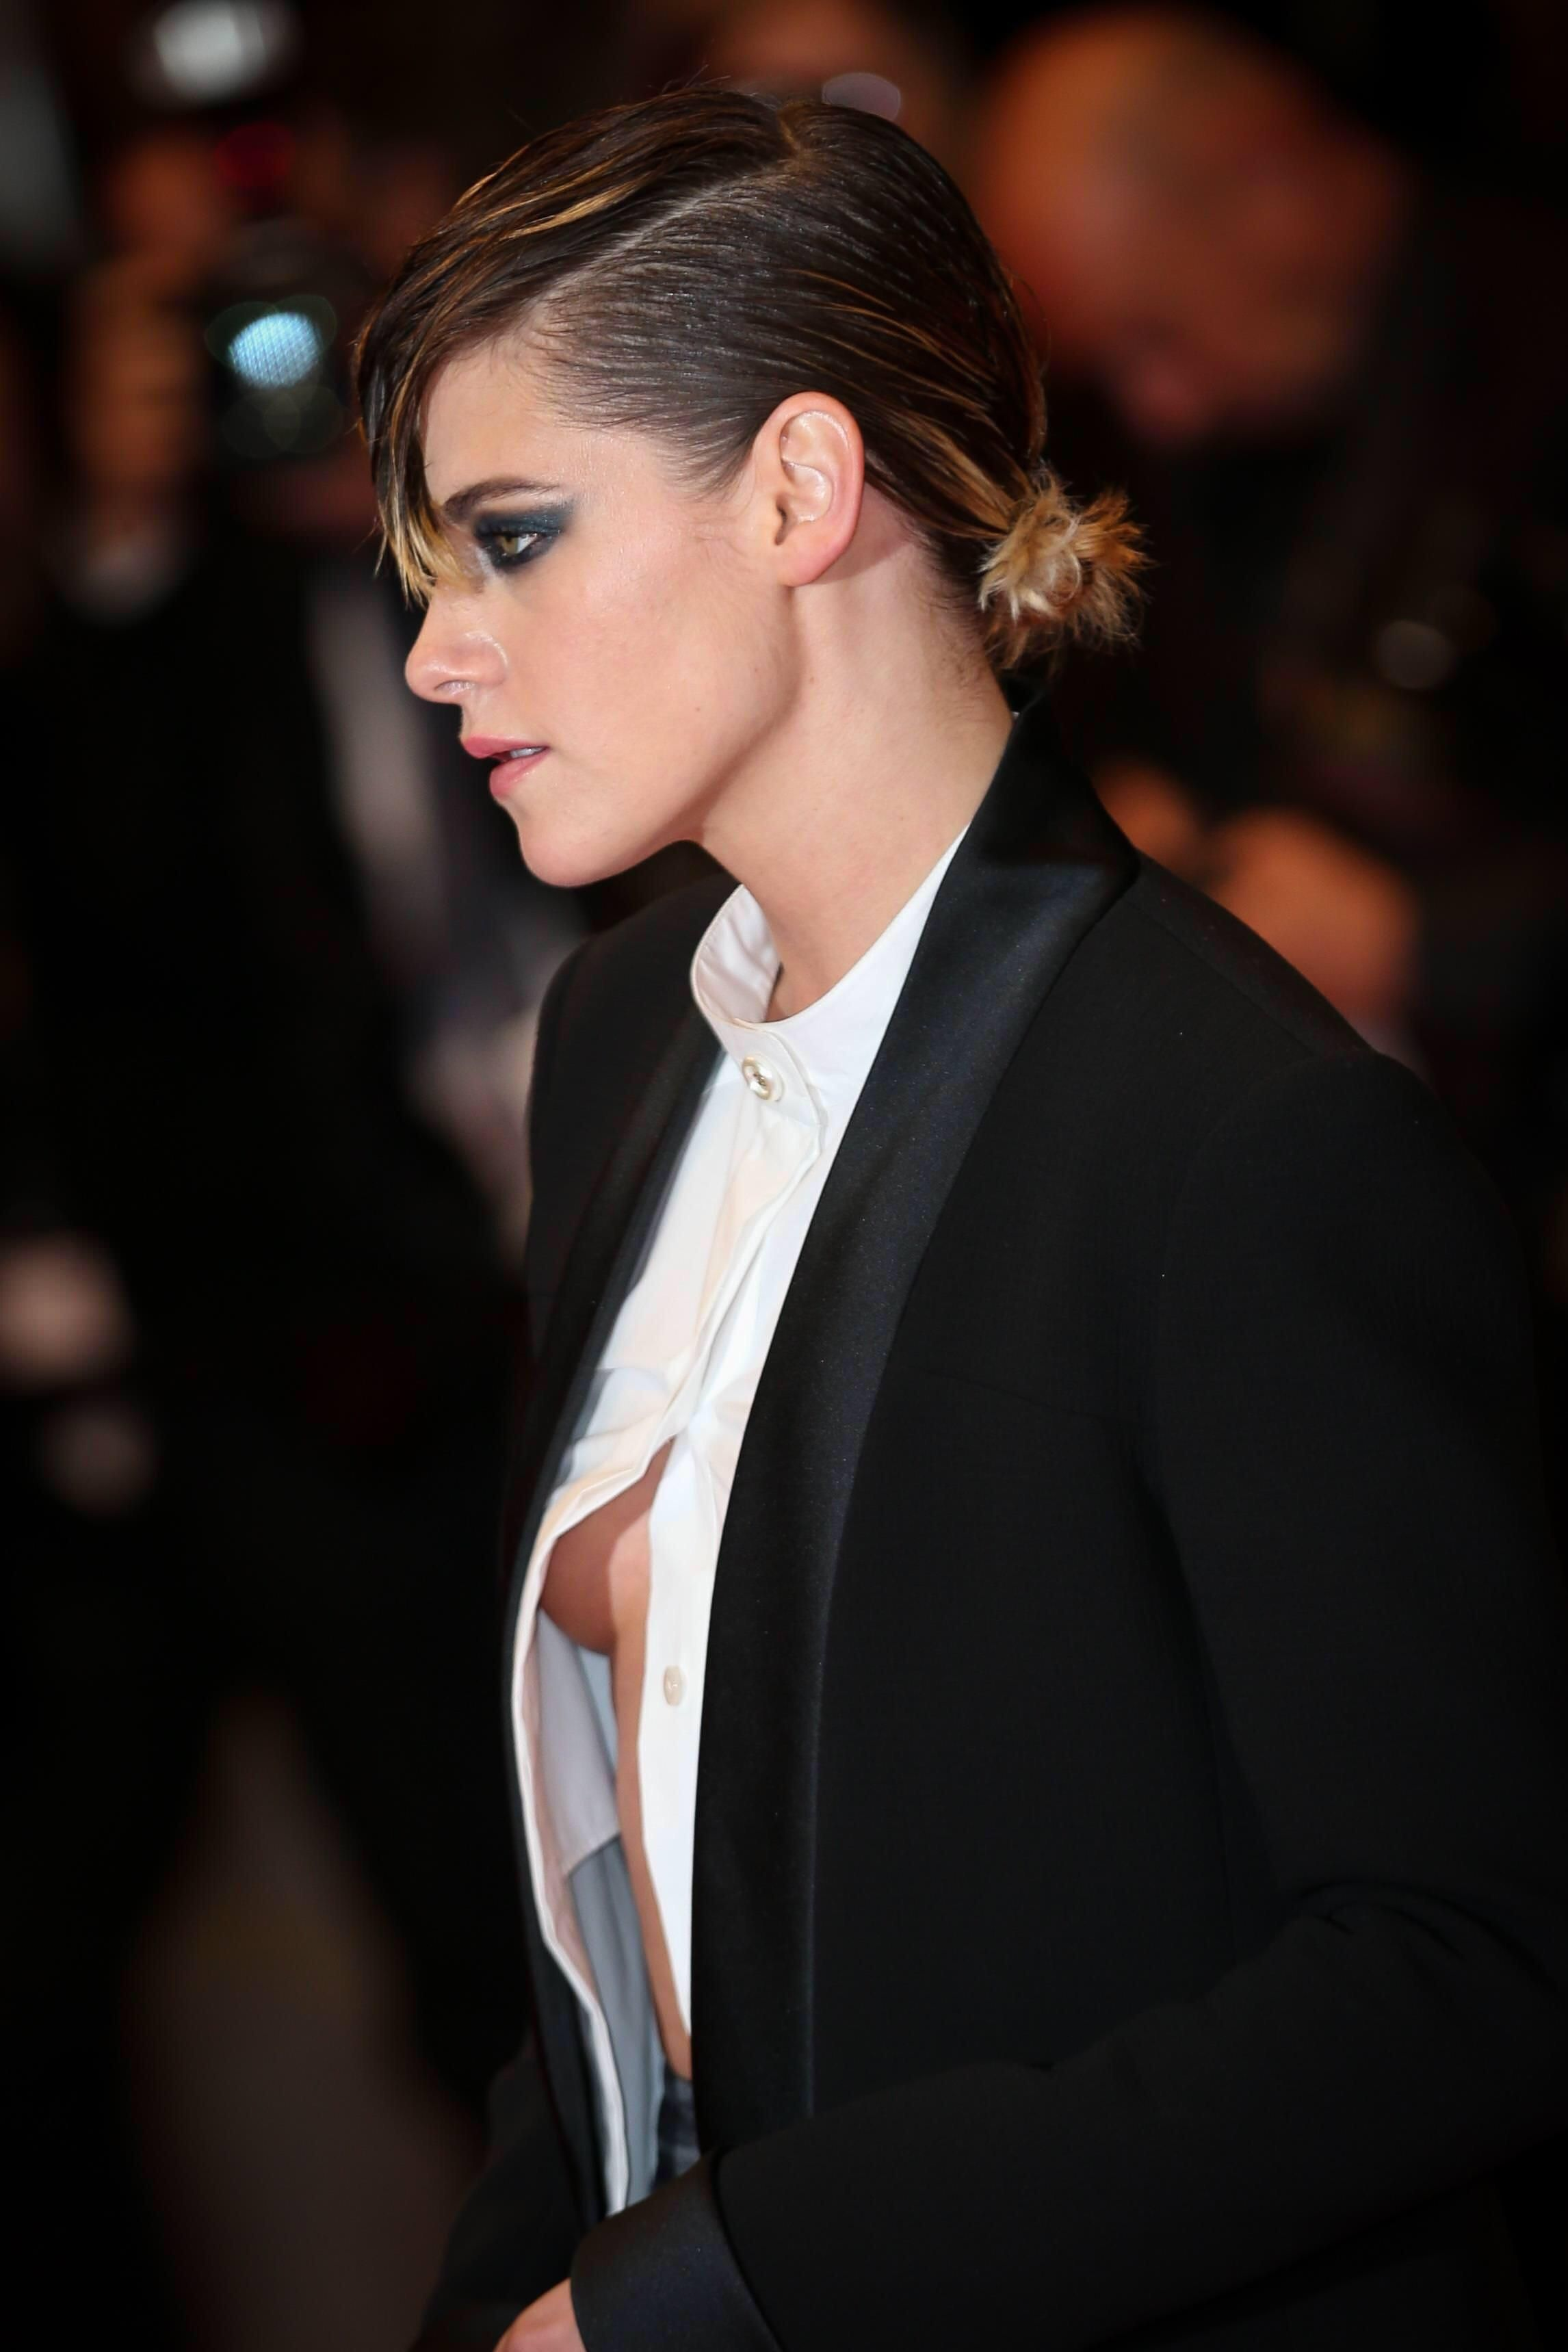 Kristen Stewart Paparazzi Sexy Pokies Photos - NuCelebs.com